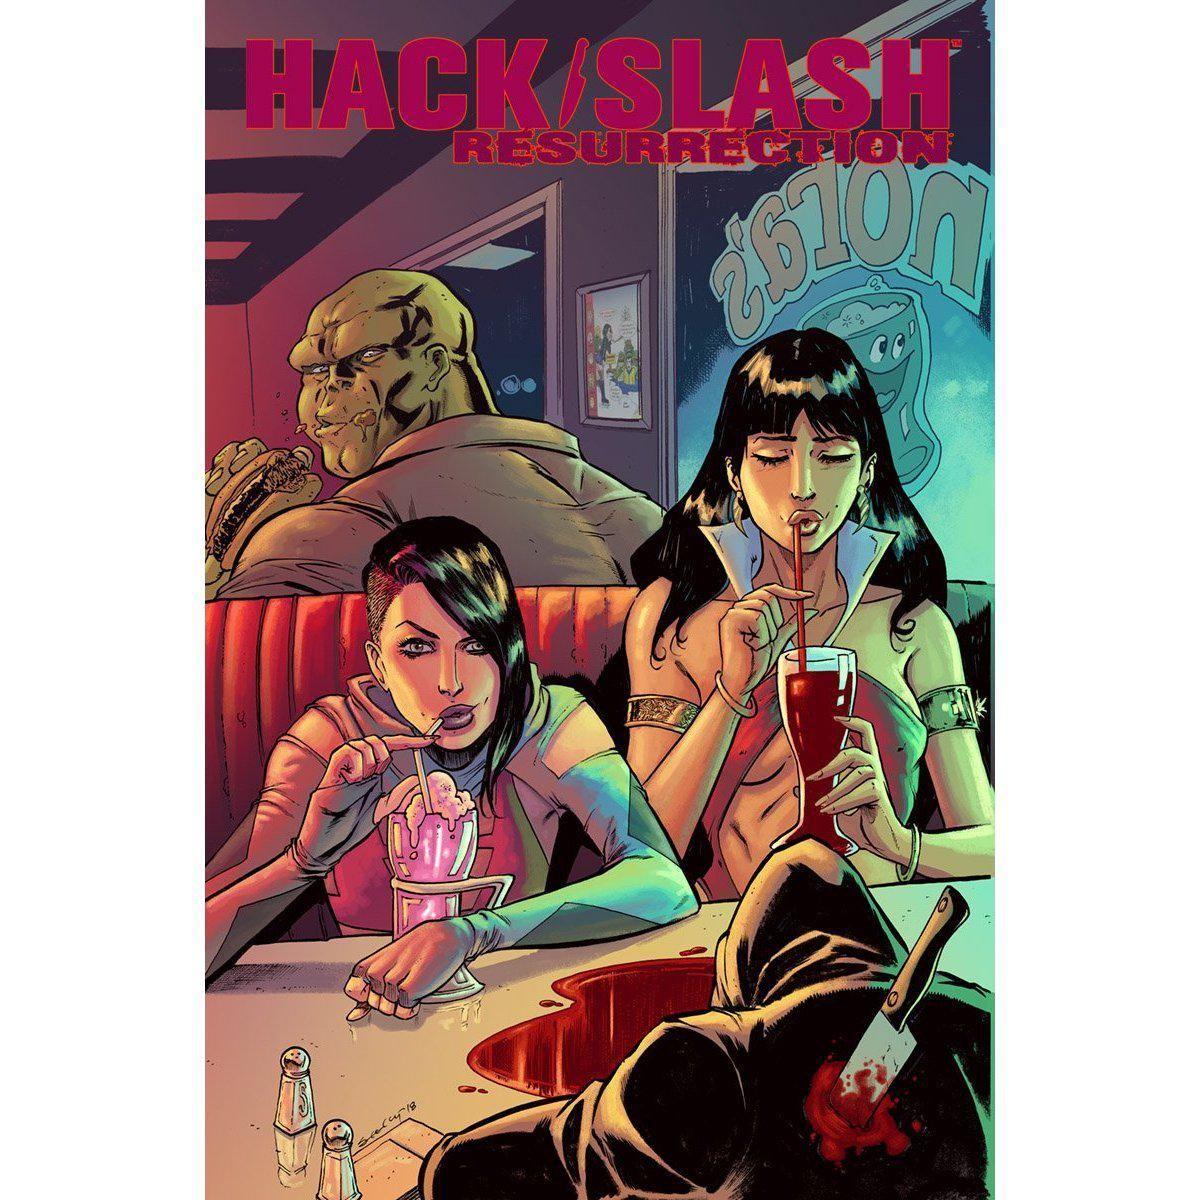 Hack Slash Resurrection 9 Cvr A Seeley Mr Hack And Slash Image Comics Cosmic Comics